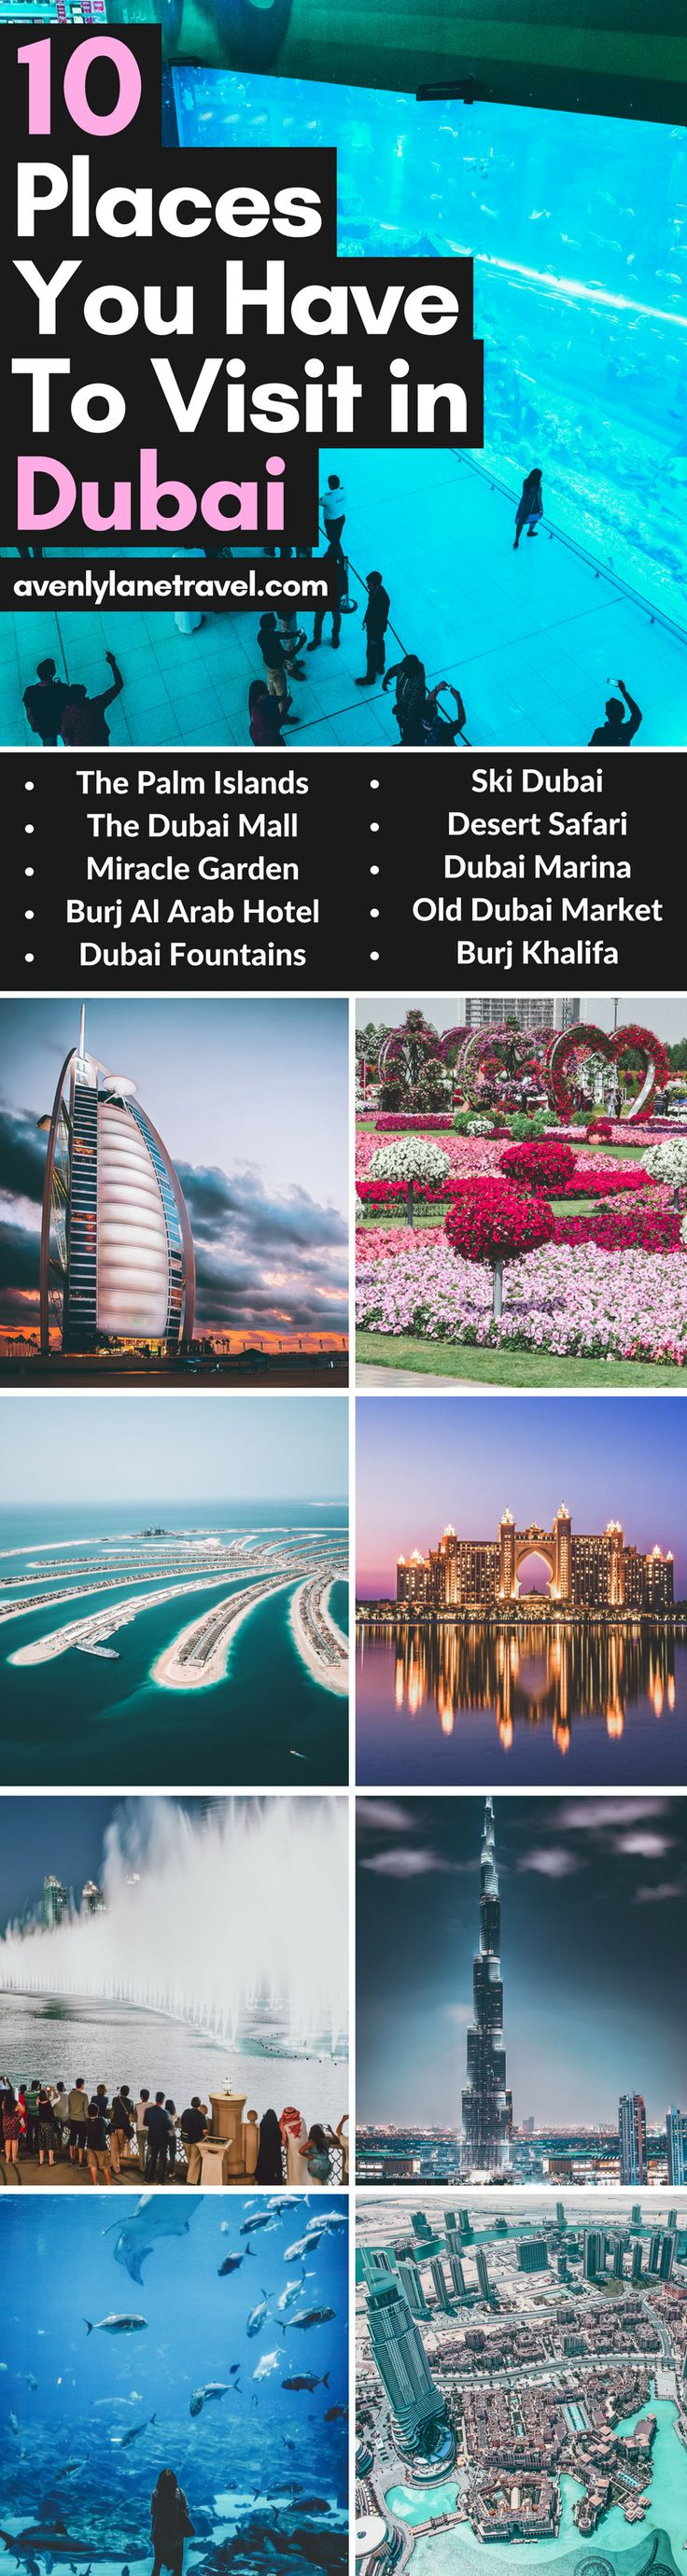 THE BEST Nightlife in Dubai - TripAdvisor